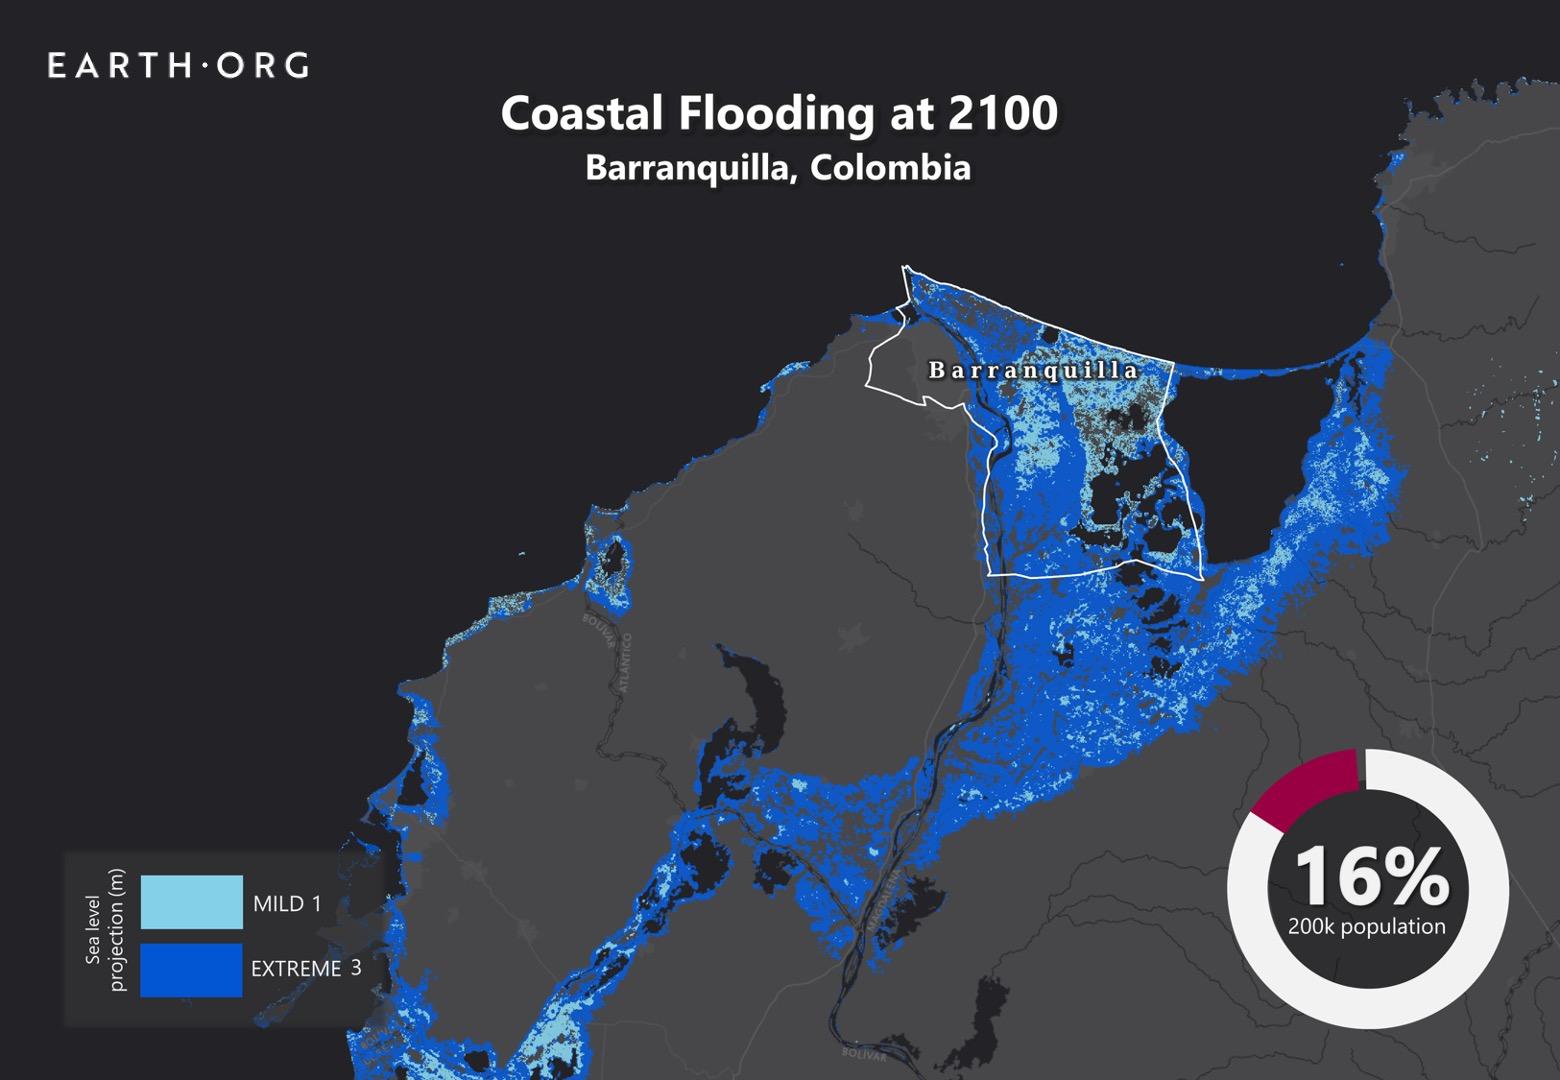 sea level rise by 2100 barranquilla